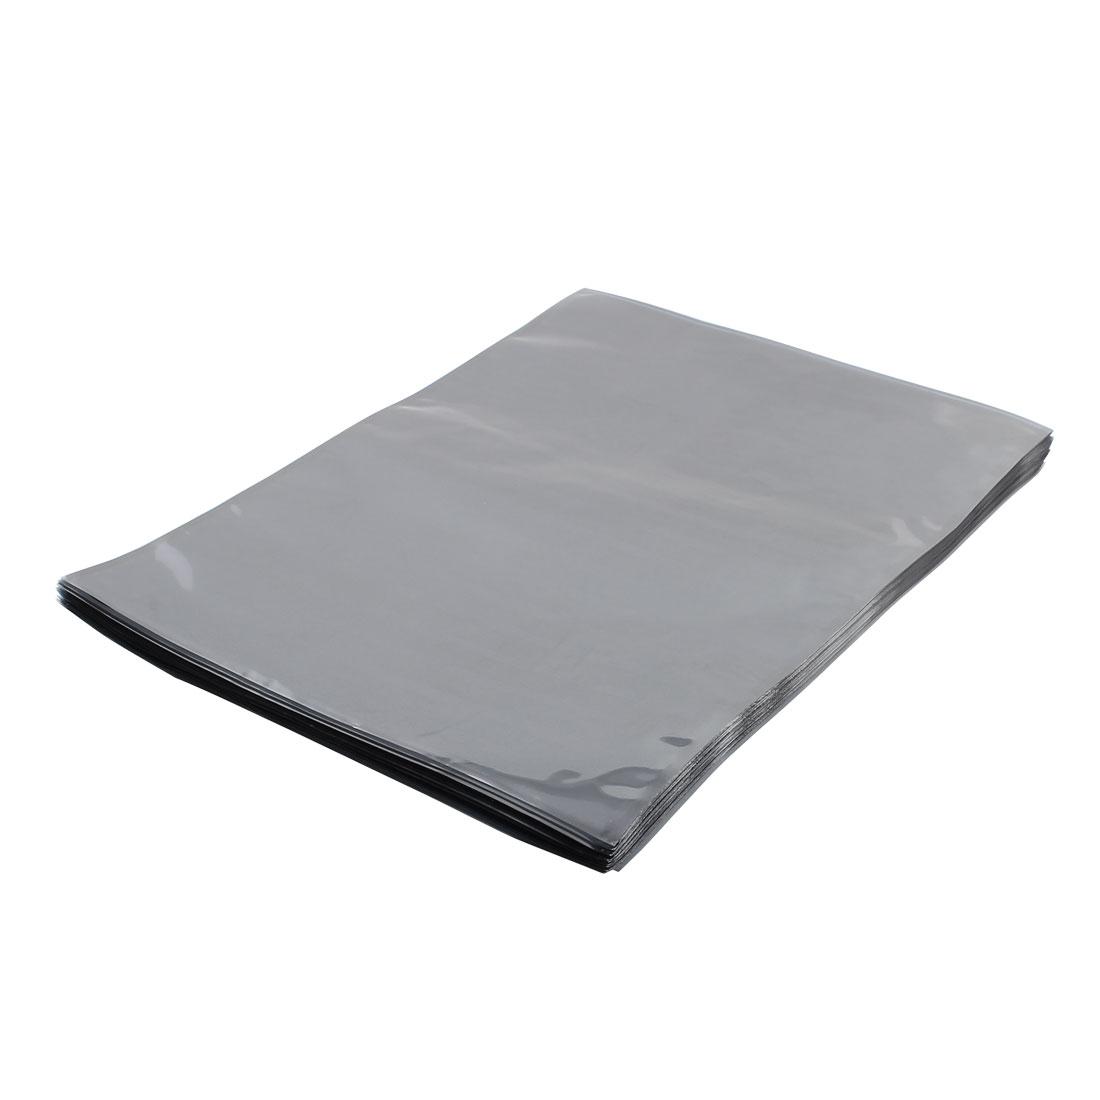 50 Pcs 210mm x 240mm Silver Tone Flat Open Top Anti Static Bag For Electronics